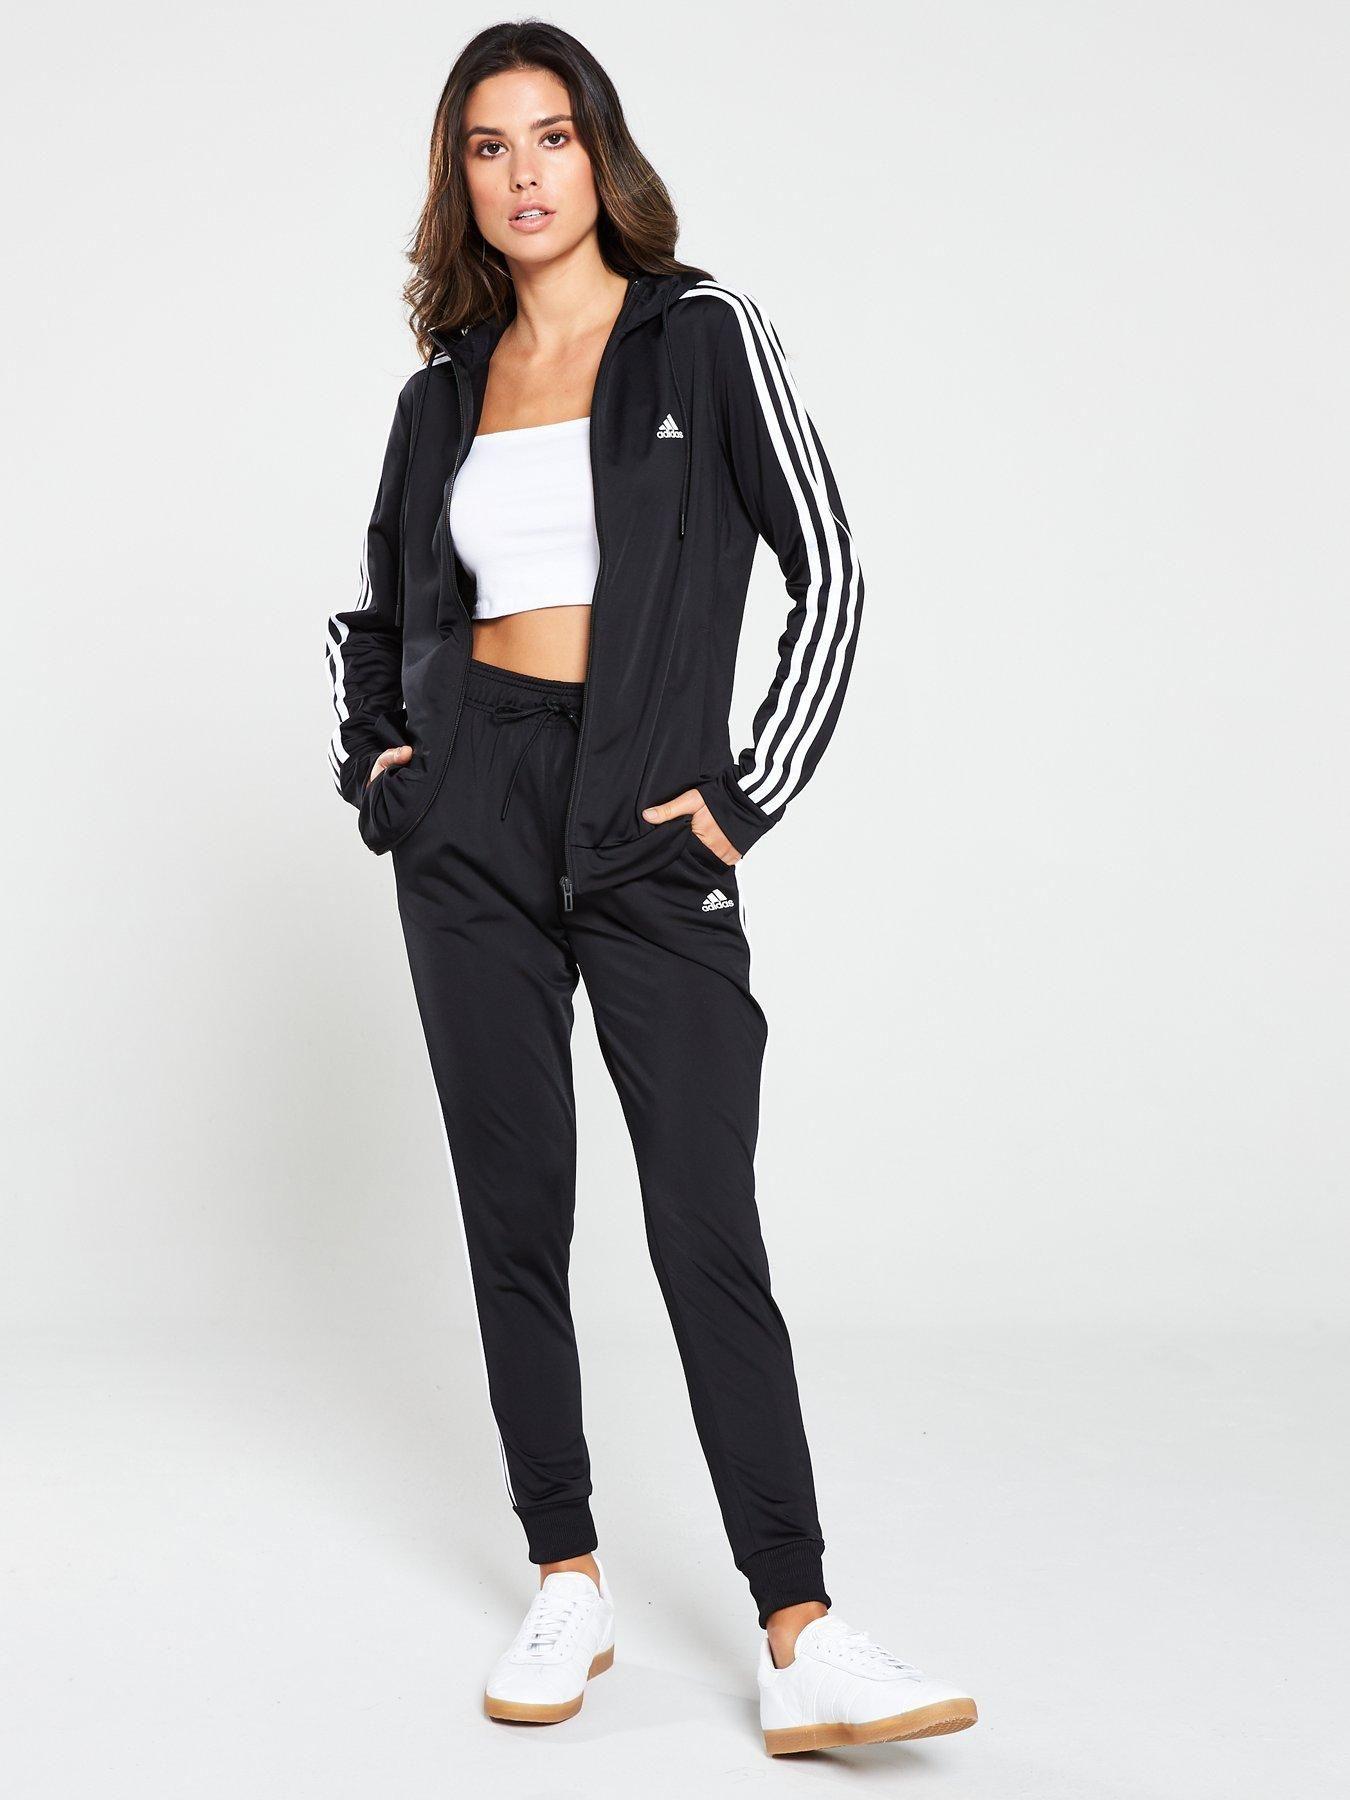 adidas shorts jumpsuit